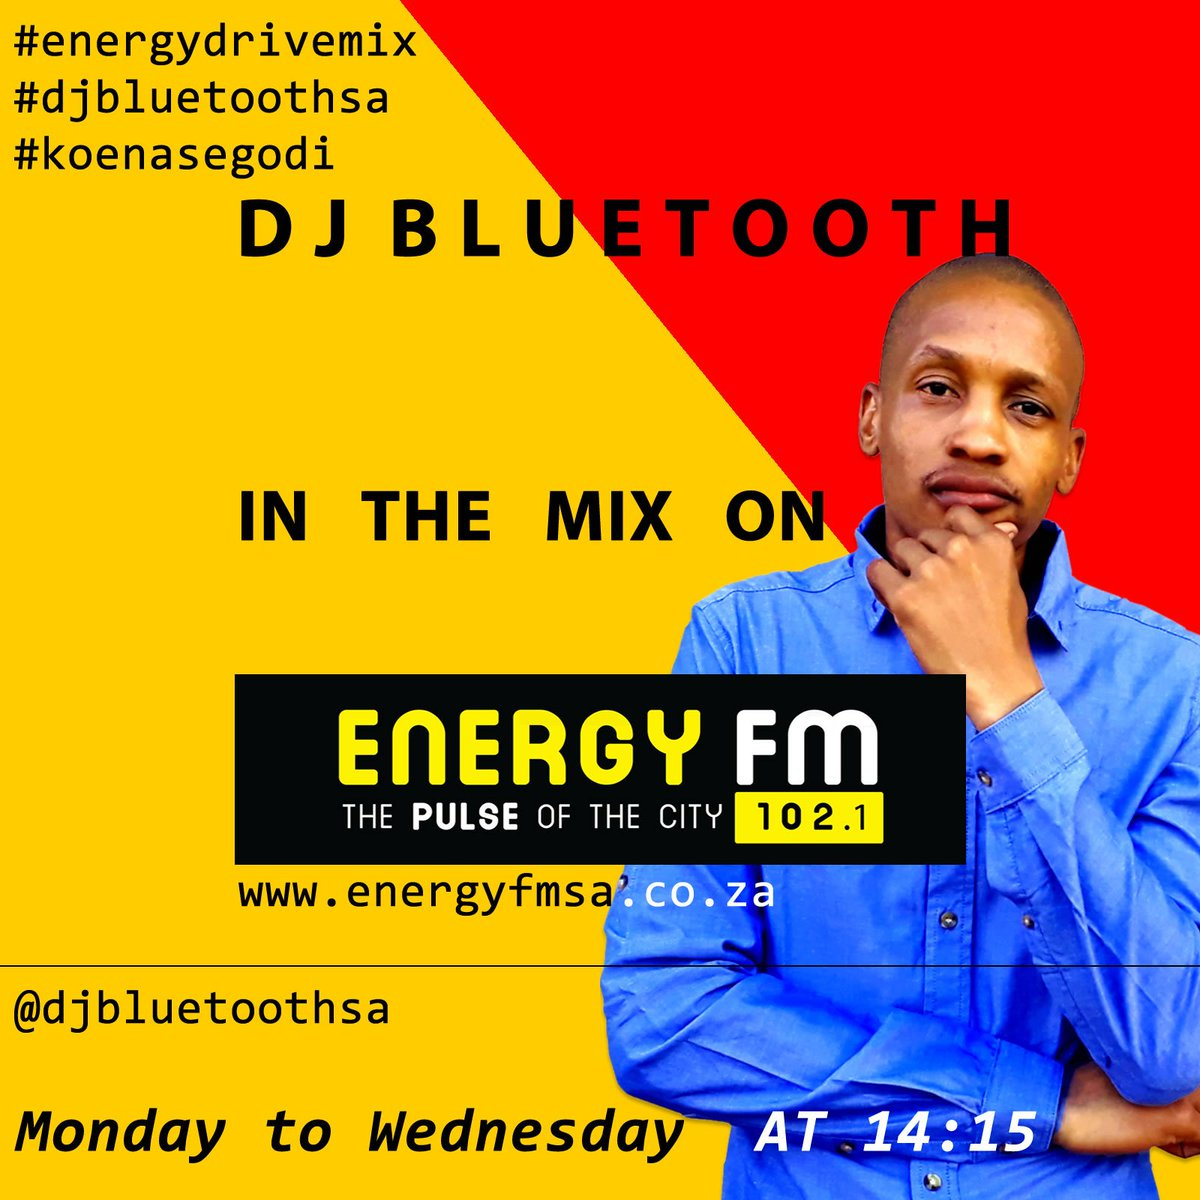 it's a Monday, do tune onto @EnergyfmSA & @choicefmsa for my #energydrivemix  #energydrive #energyfmsa #djbluetoothsa #koenasegodi #segodipropic.twitter.com/xEPEkARDtw